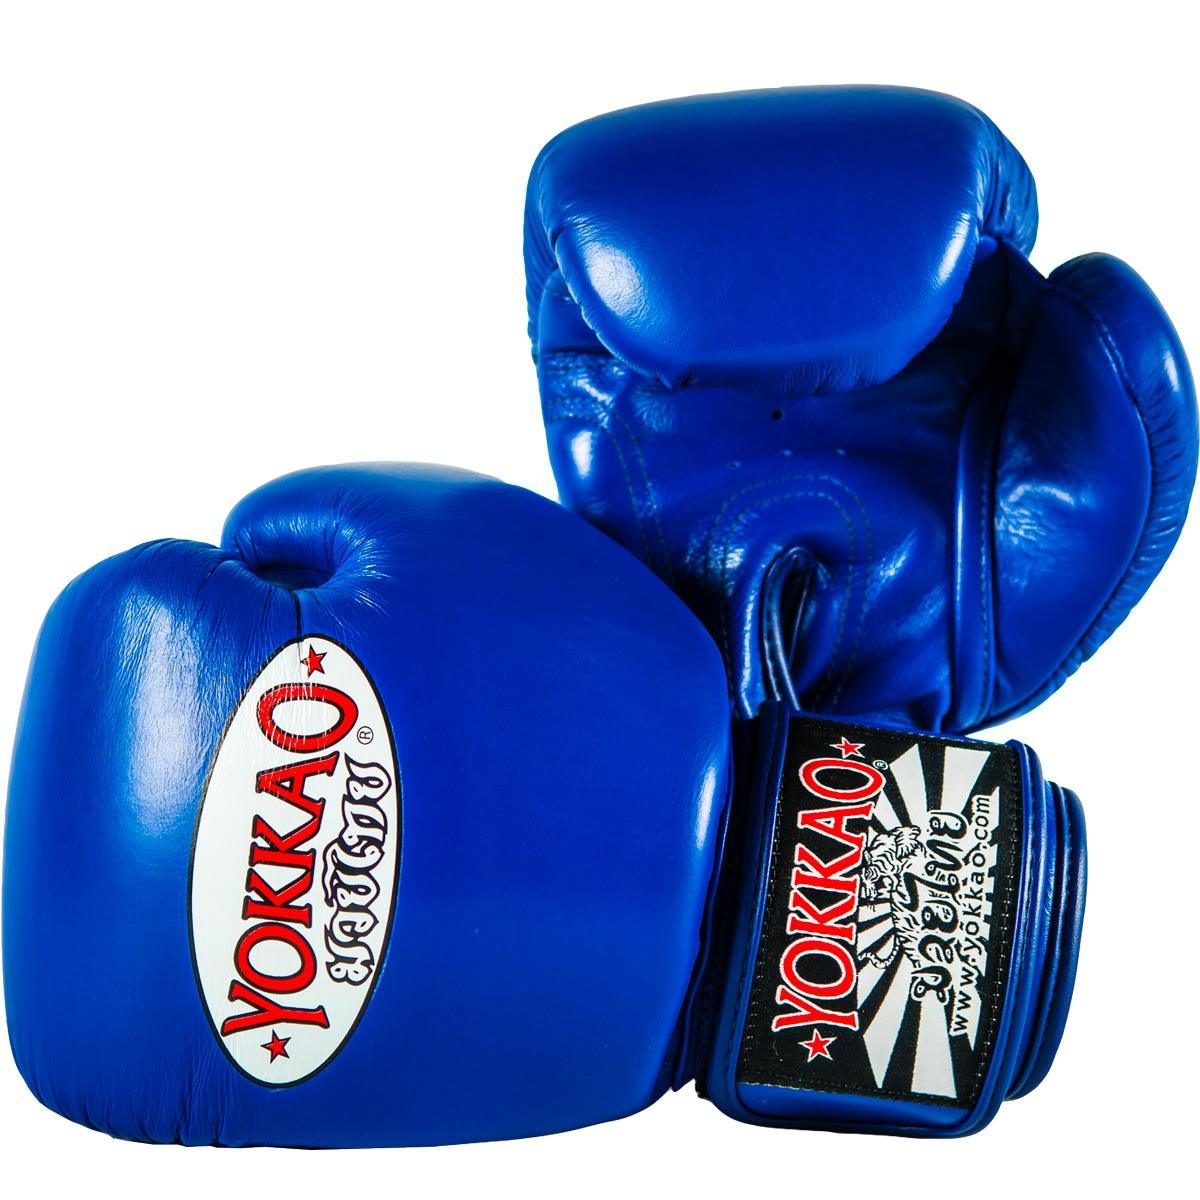 matrix-blue-boxing-gloves-e8a